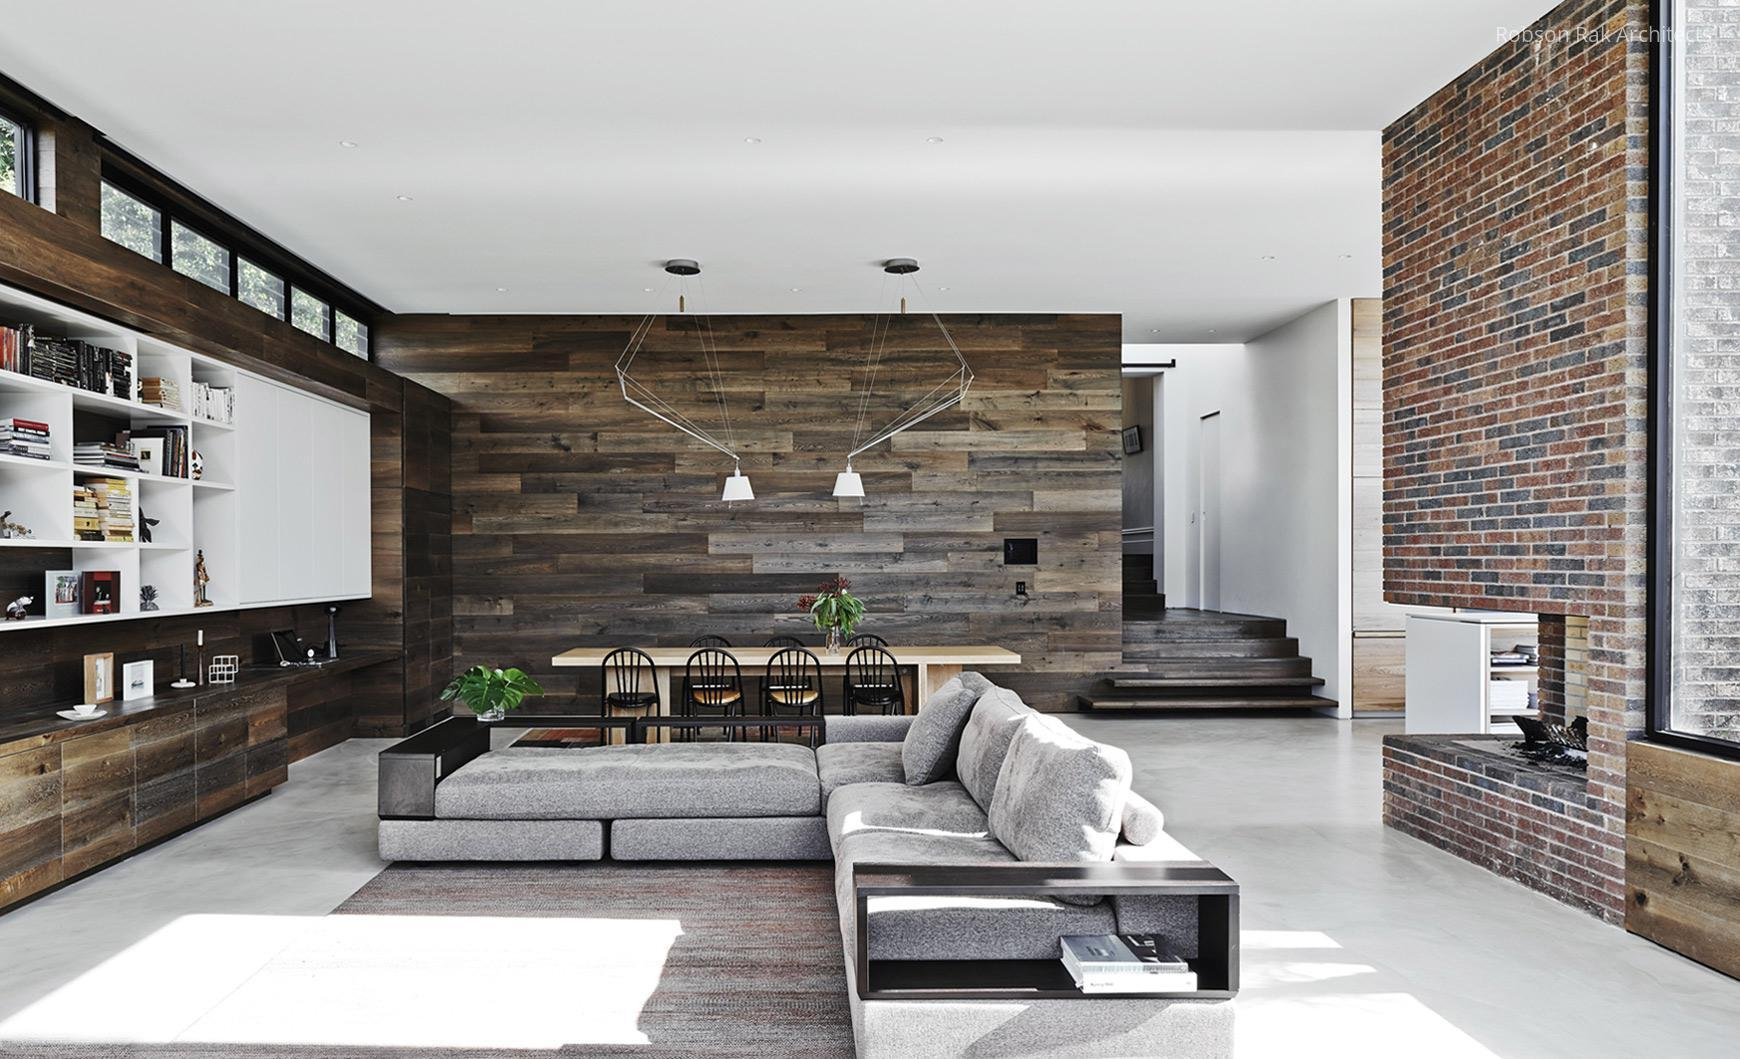 K l nleges falburkolat inspir ci t r for Living room newcastle